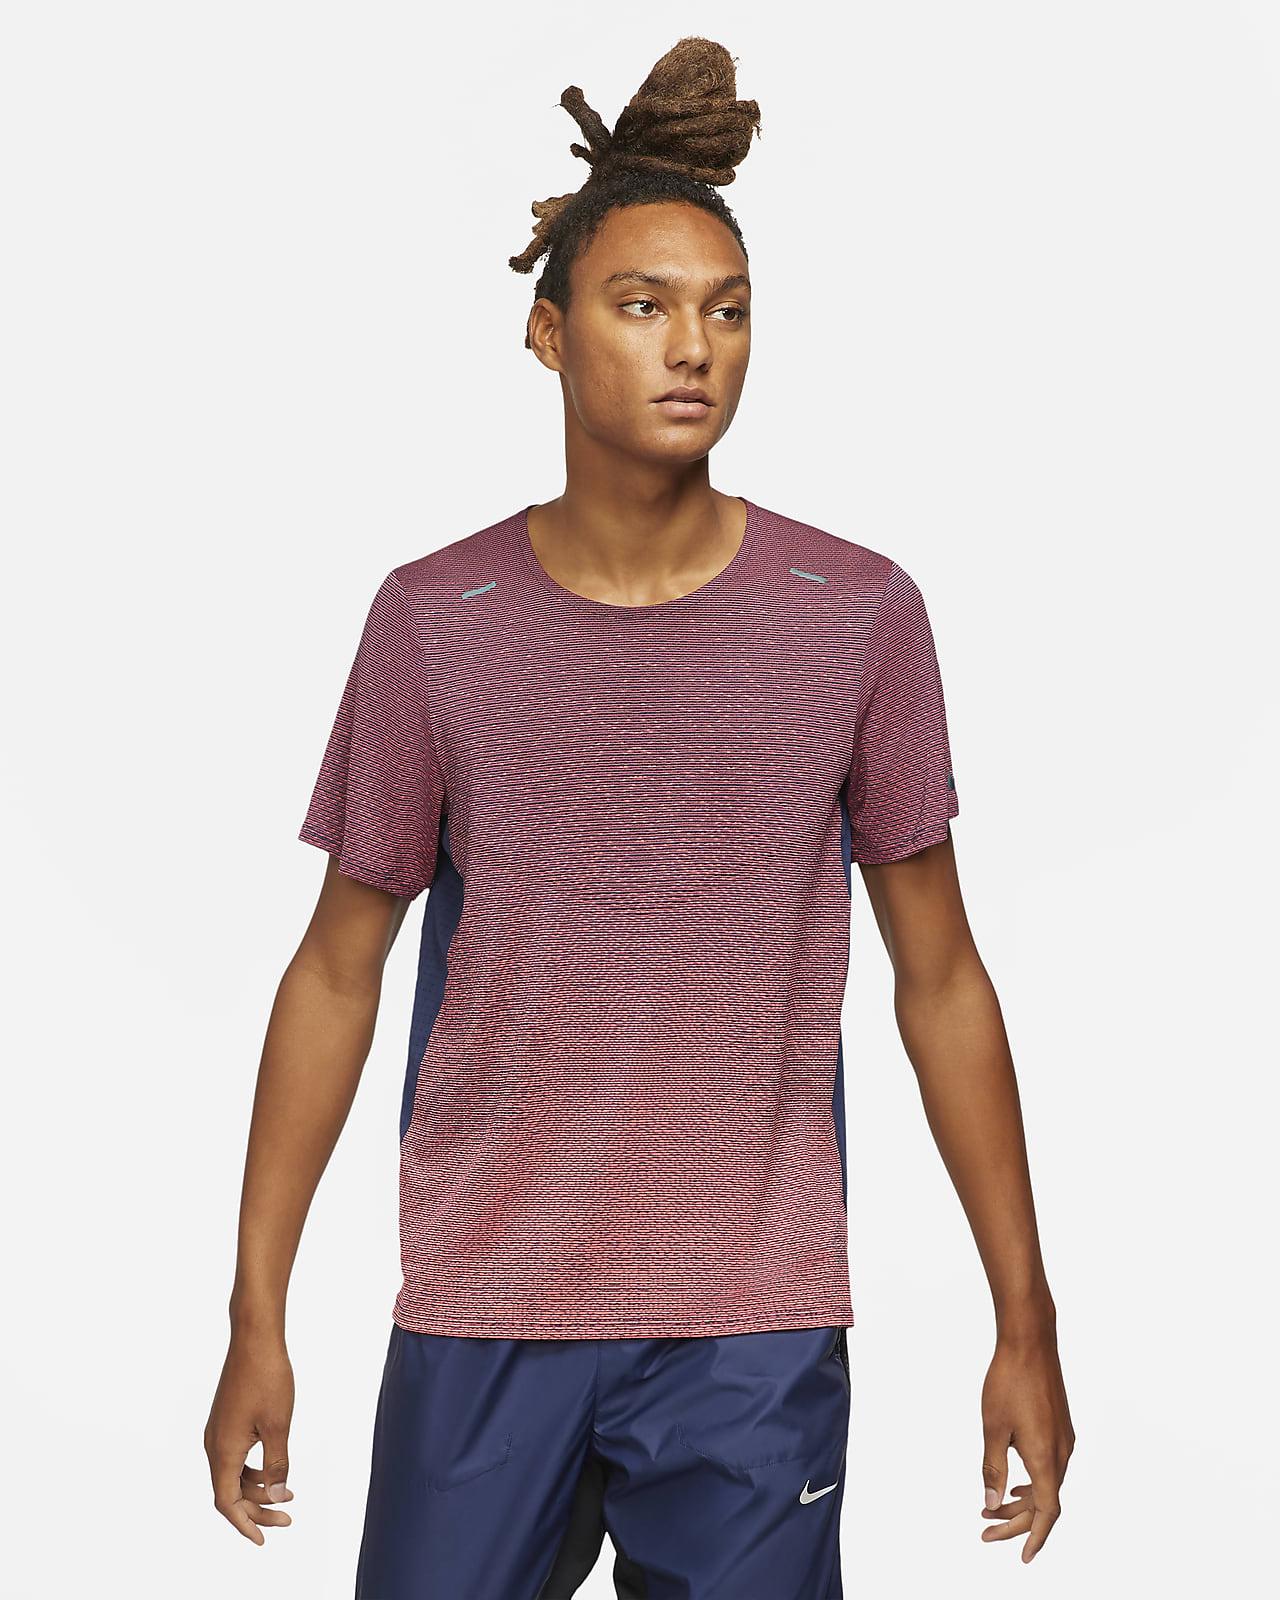 Camiseta de running de manga corta para hombre Nike Pinnacle Run Division